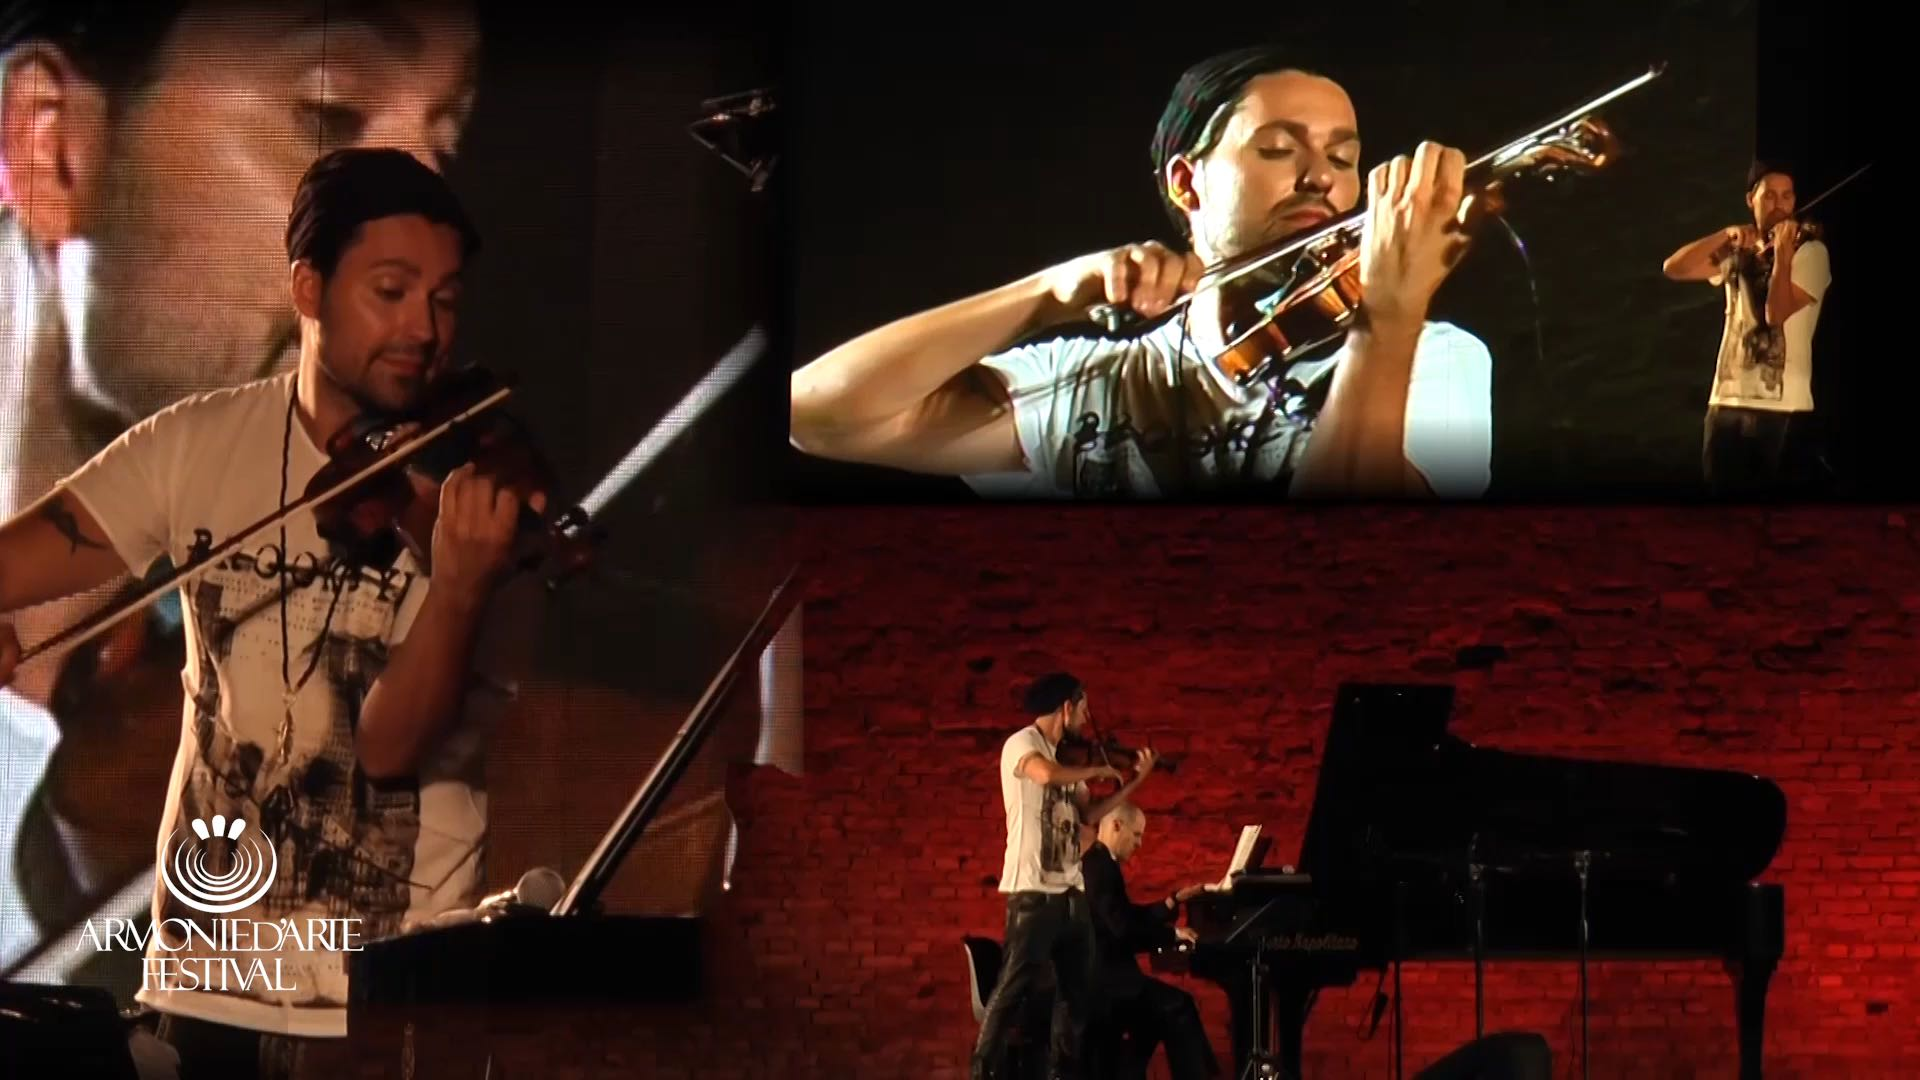 David Garrett & Julien Quentin – Armonie d'Arte Festival